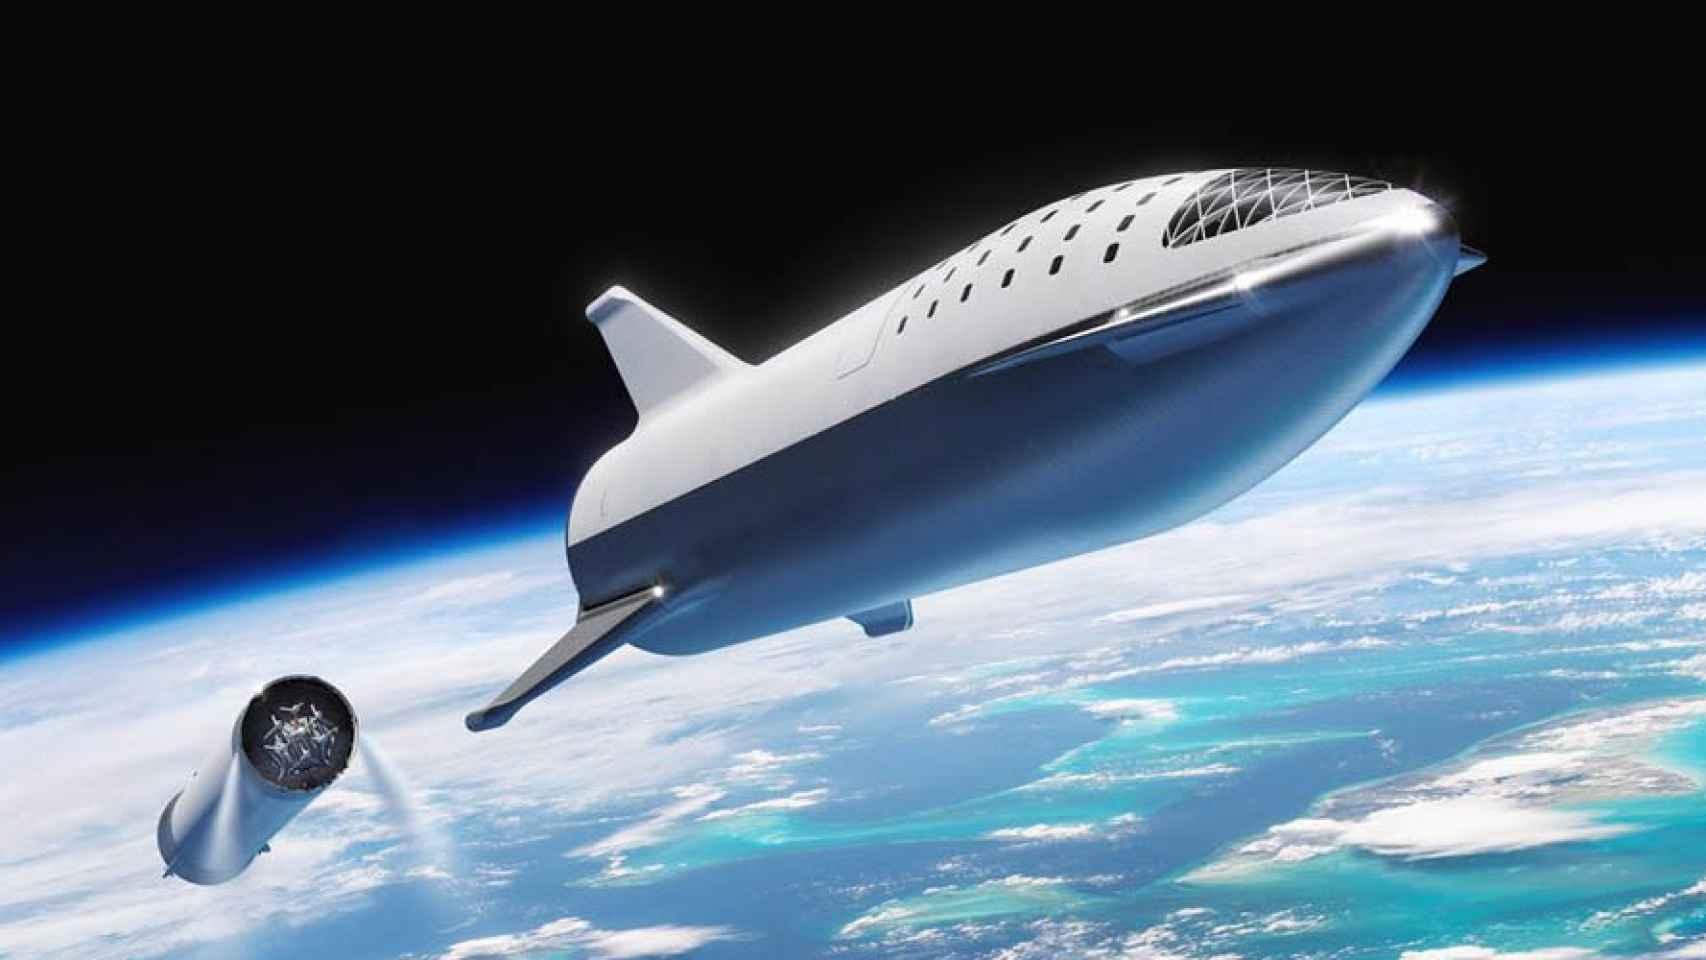 bfr big falcon rocket primer viaje turistico a la luna spacex